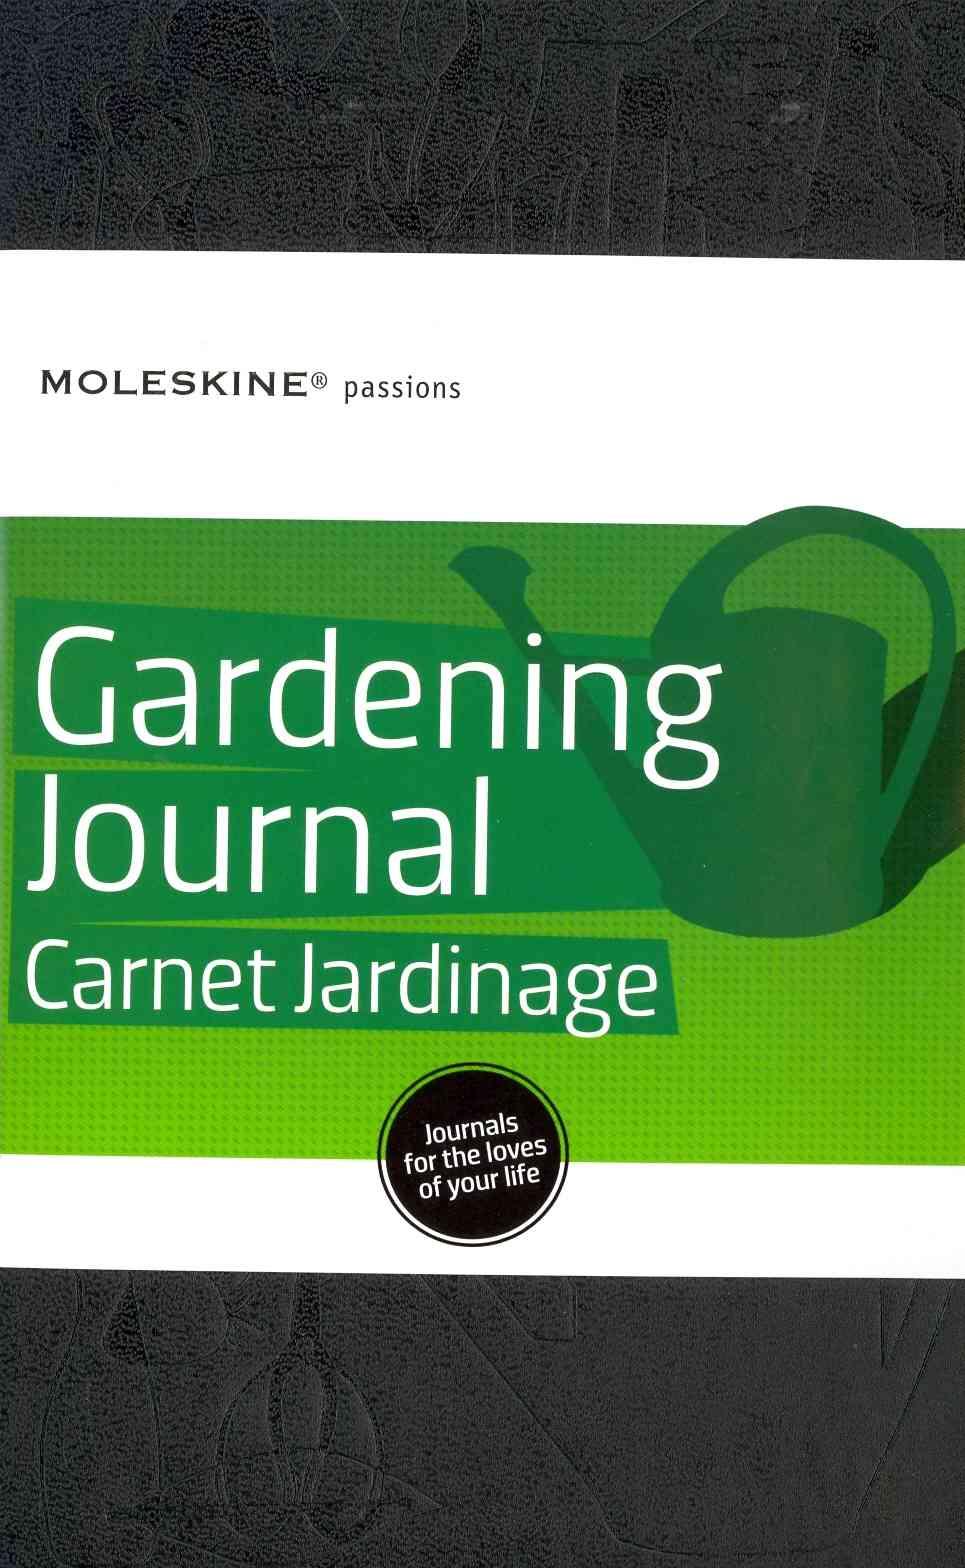 Moleskine Passions Gardening Journal By Moleskine